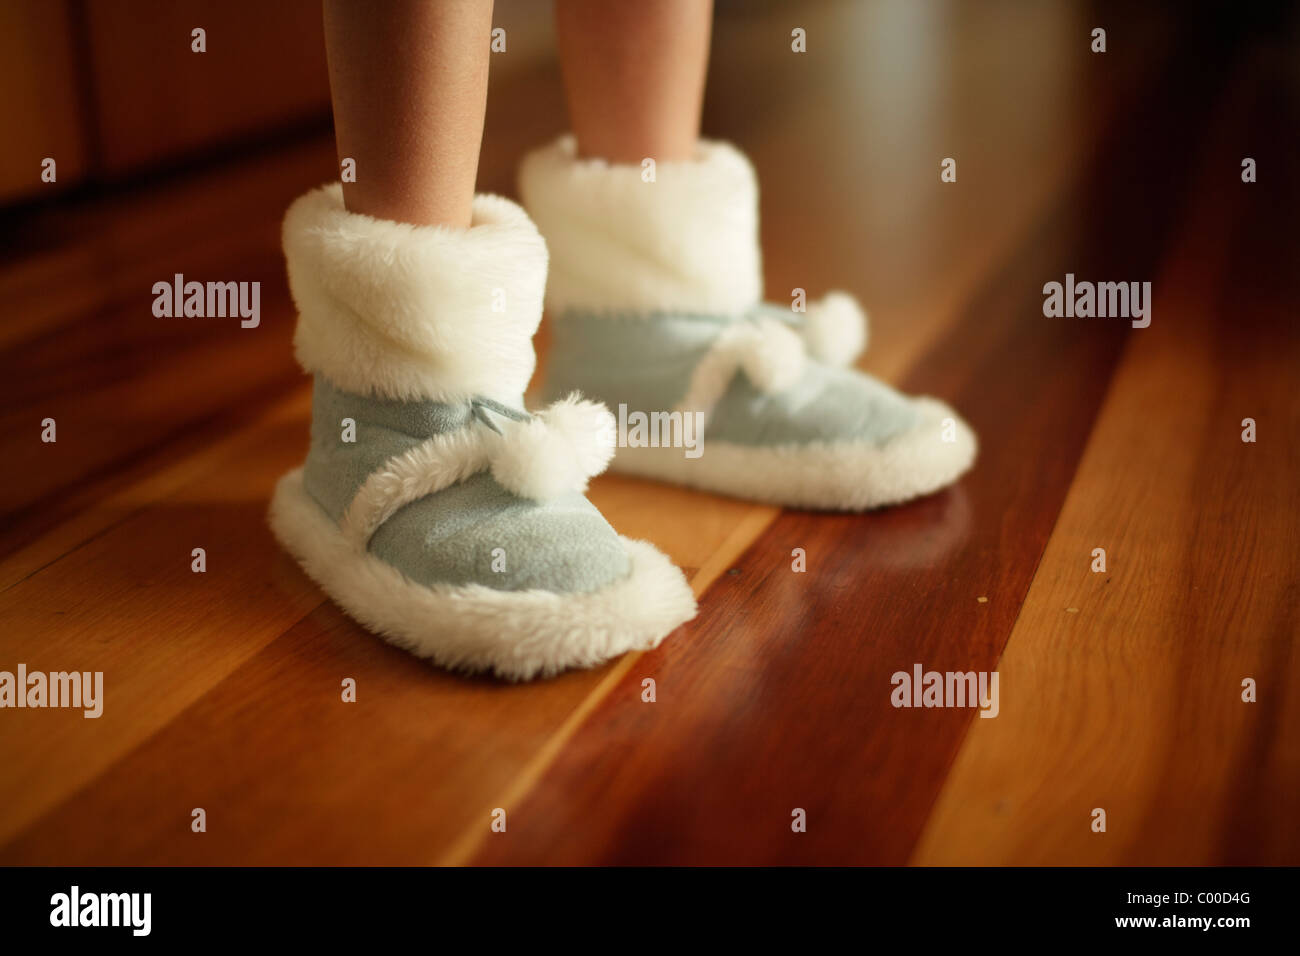 Des Mädchens warme Hausschuhe auf hölzernen Fussboden aus synthetischem Lammfell Stockbild